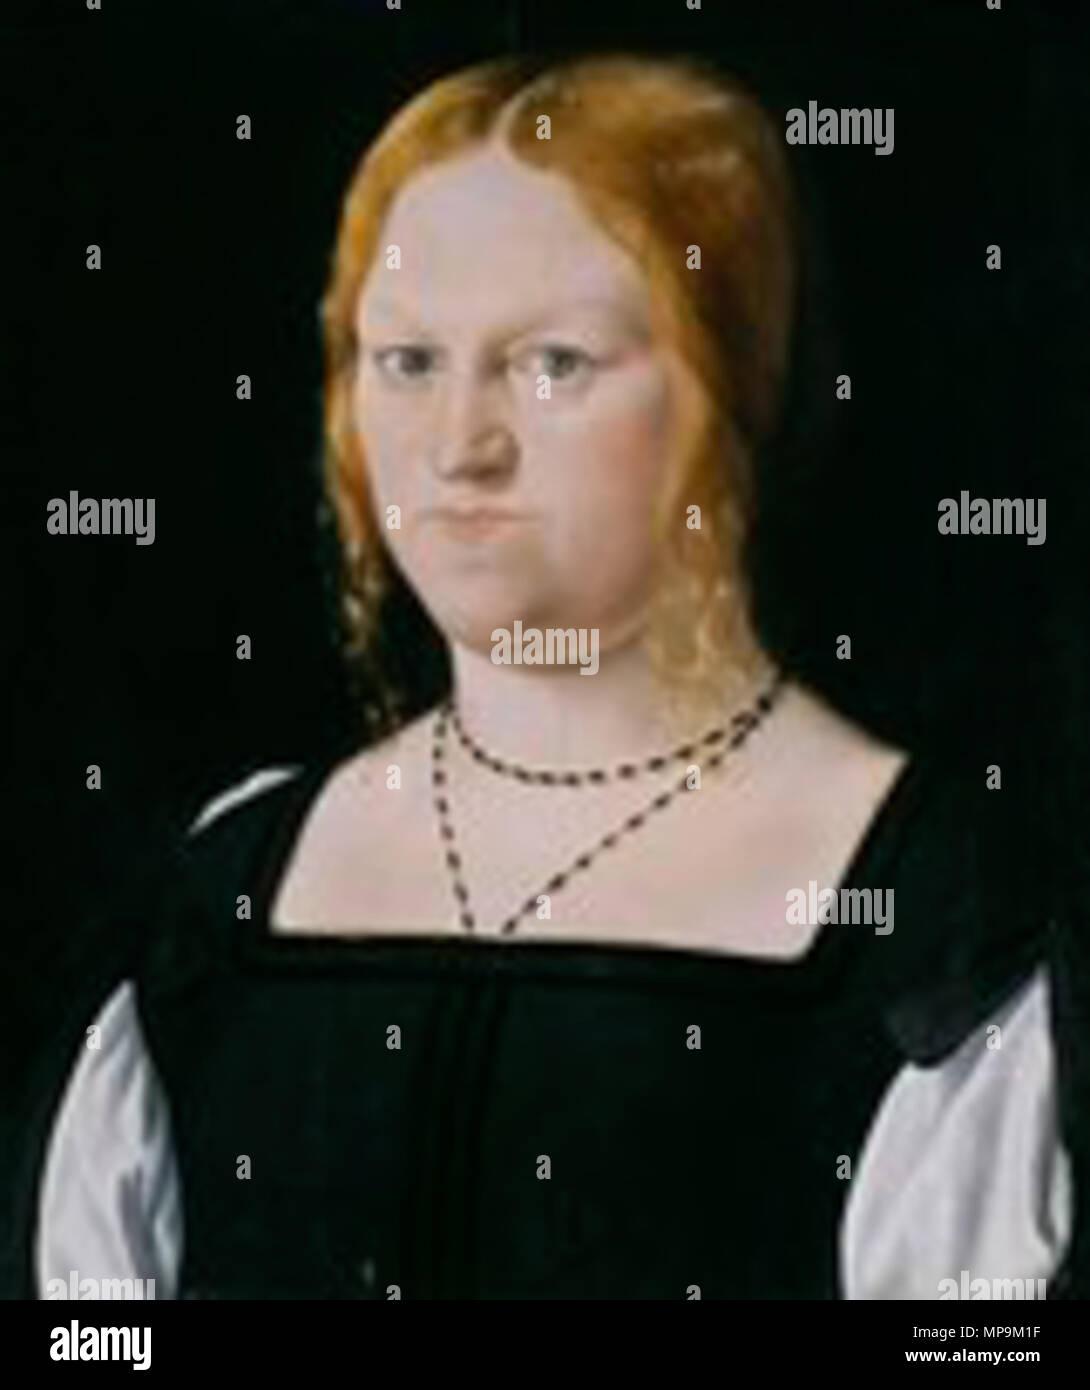 . Woman . 16th century.   Lorenzo Lotto (1480–)   Description Italian painter and fresco painter  Date of birth/death circa 1480 1556 / 1557  Location of birth/death Venice Loreto  Work location Recanati (1506-1508), Venice (1500), Treviso (1503-1506), Rome (1509-1512), Bergamo (1513-1525), Venice (1513-1517), Treviso (1525-1527), Venice (1527-1529), Loreto, Venice (1529-1539), Treviso (1540-1549), Ancona (1549), Loreto (1556)  Authority control  : Q310973 VIAF:22165049 ISNI:0000 0001 2320 0265 ULAN:500015631 LCCN:n50042418 NLA:35692463 WorldCat 820 Lorenzo Lotto 091 - Stock Image